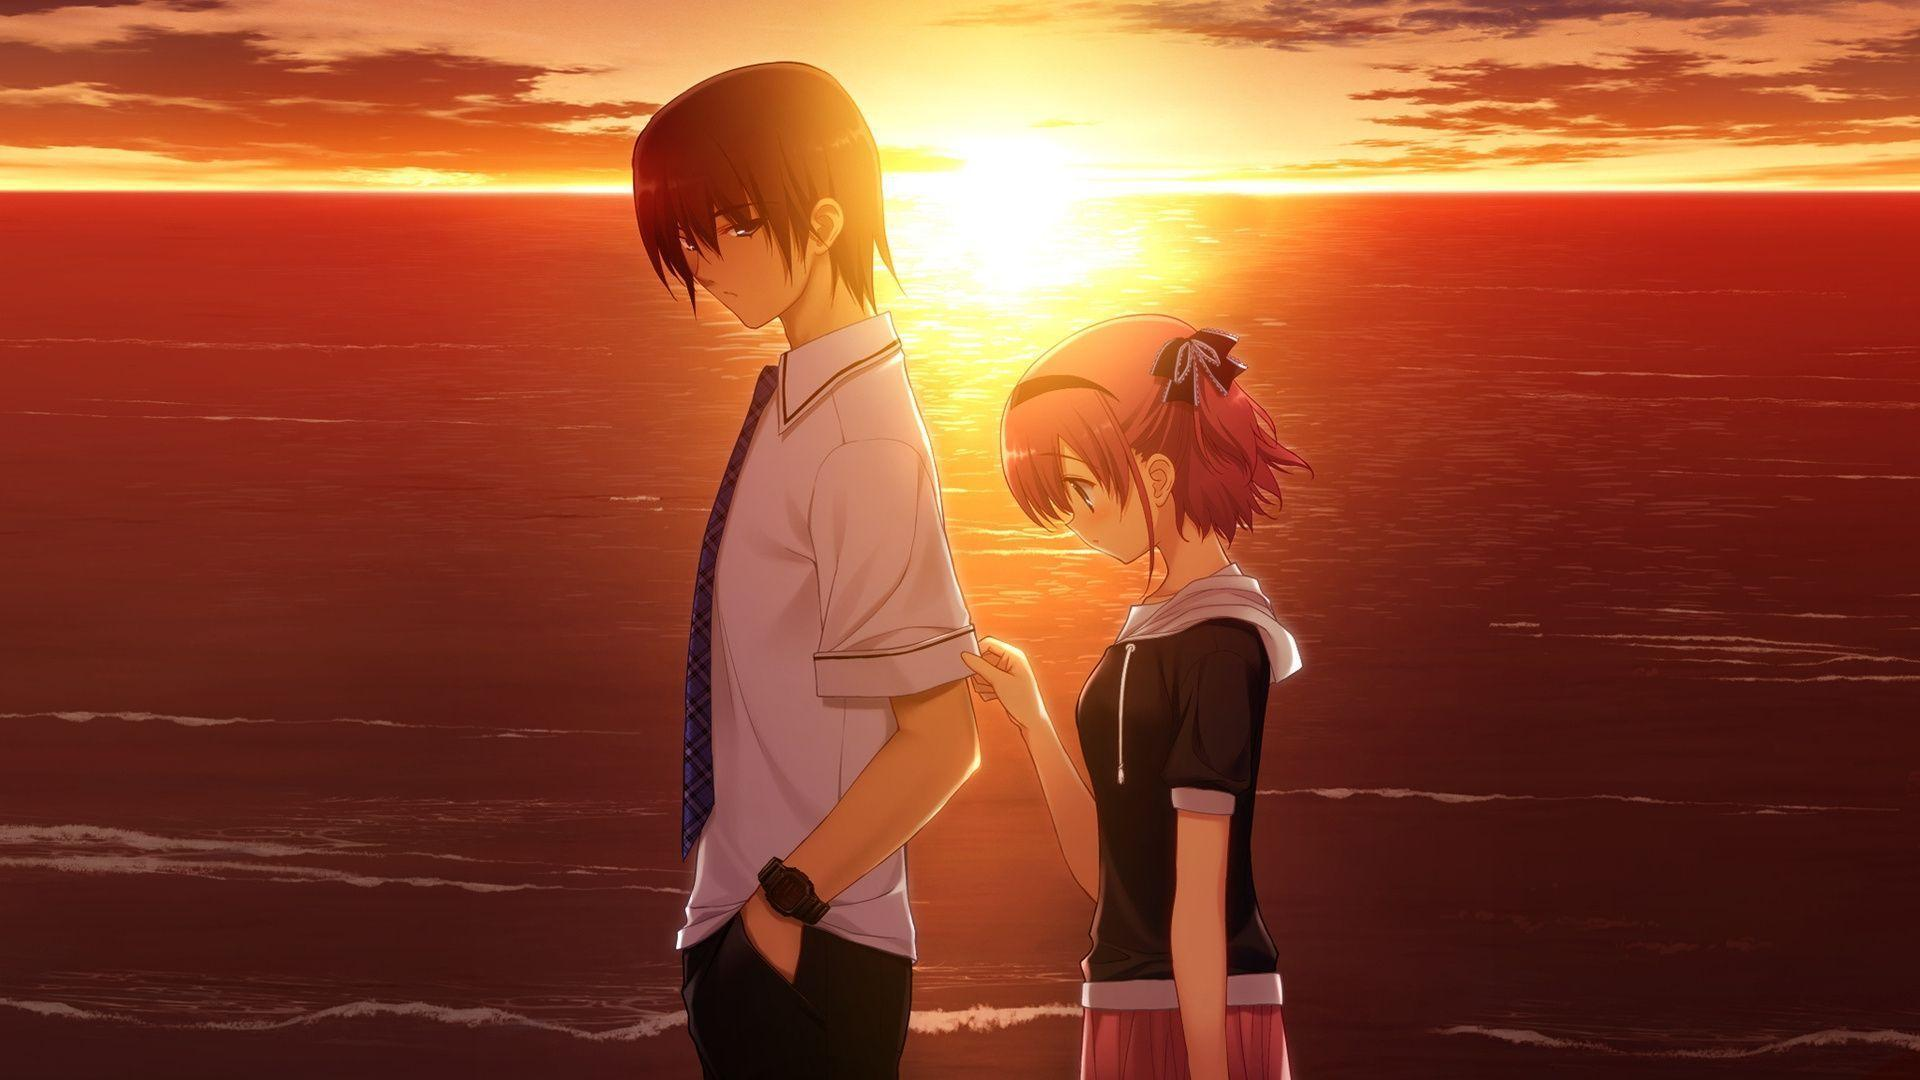 Hentai girl and boy